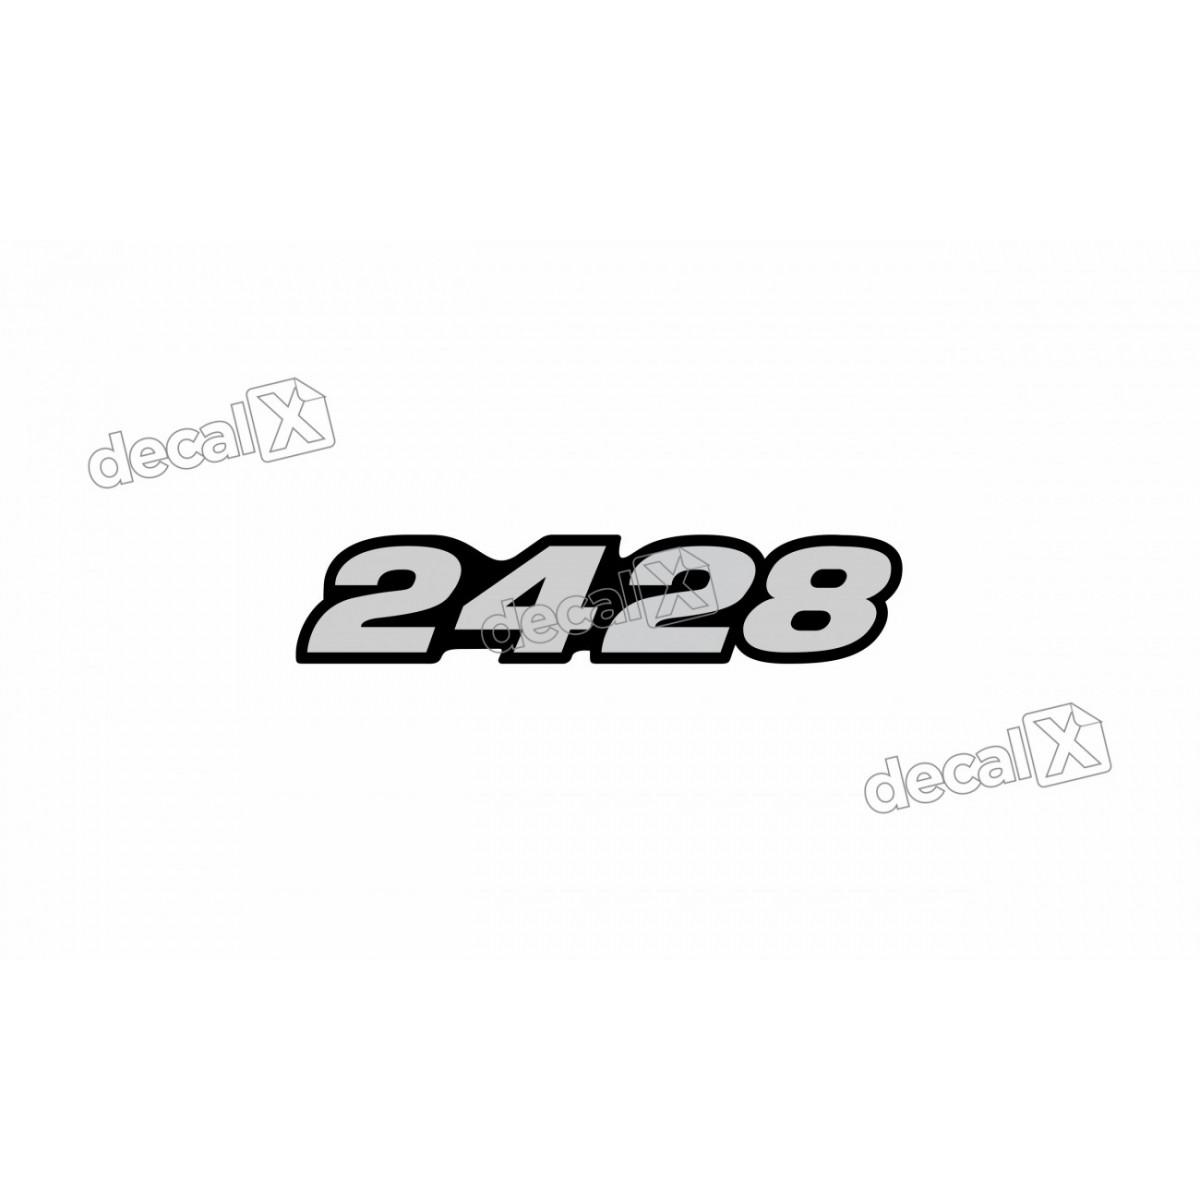 Adesivo Emblema Resinado Mercedes 2428 Cm87 Decalx